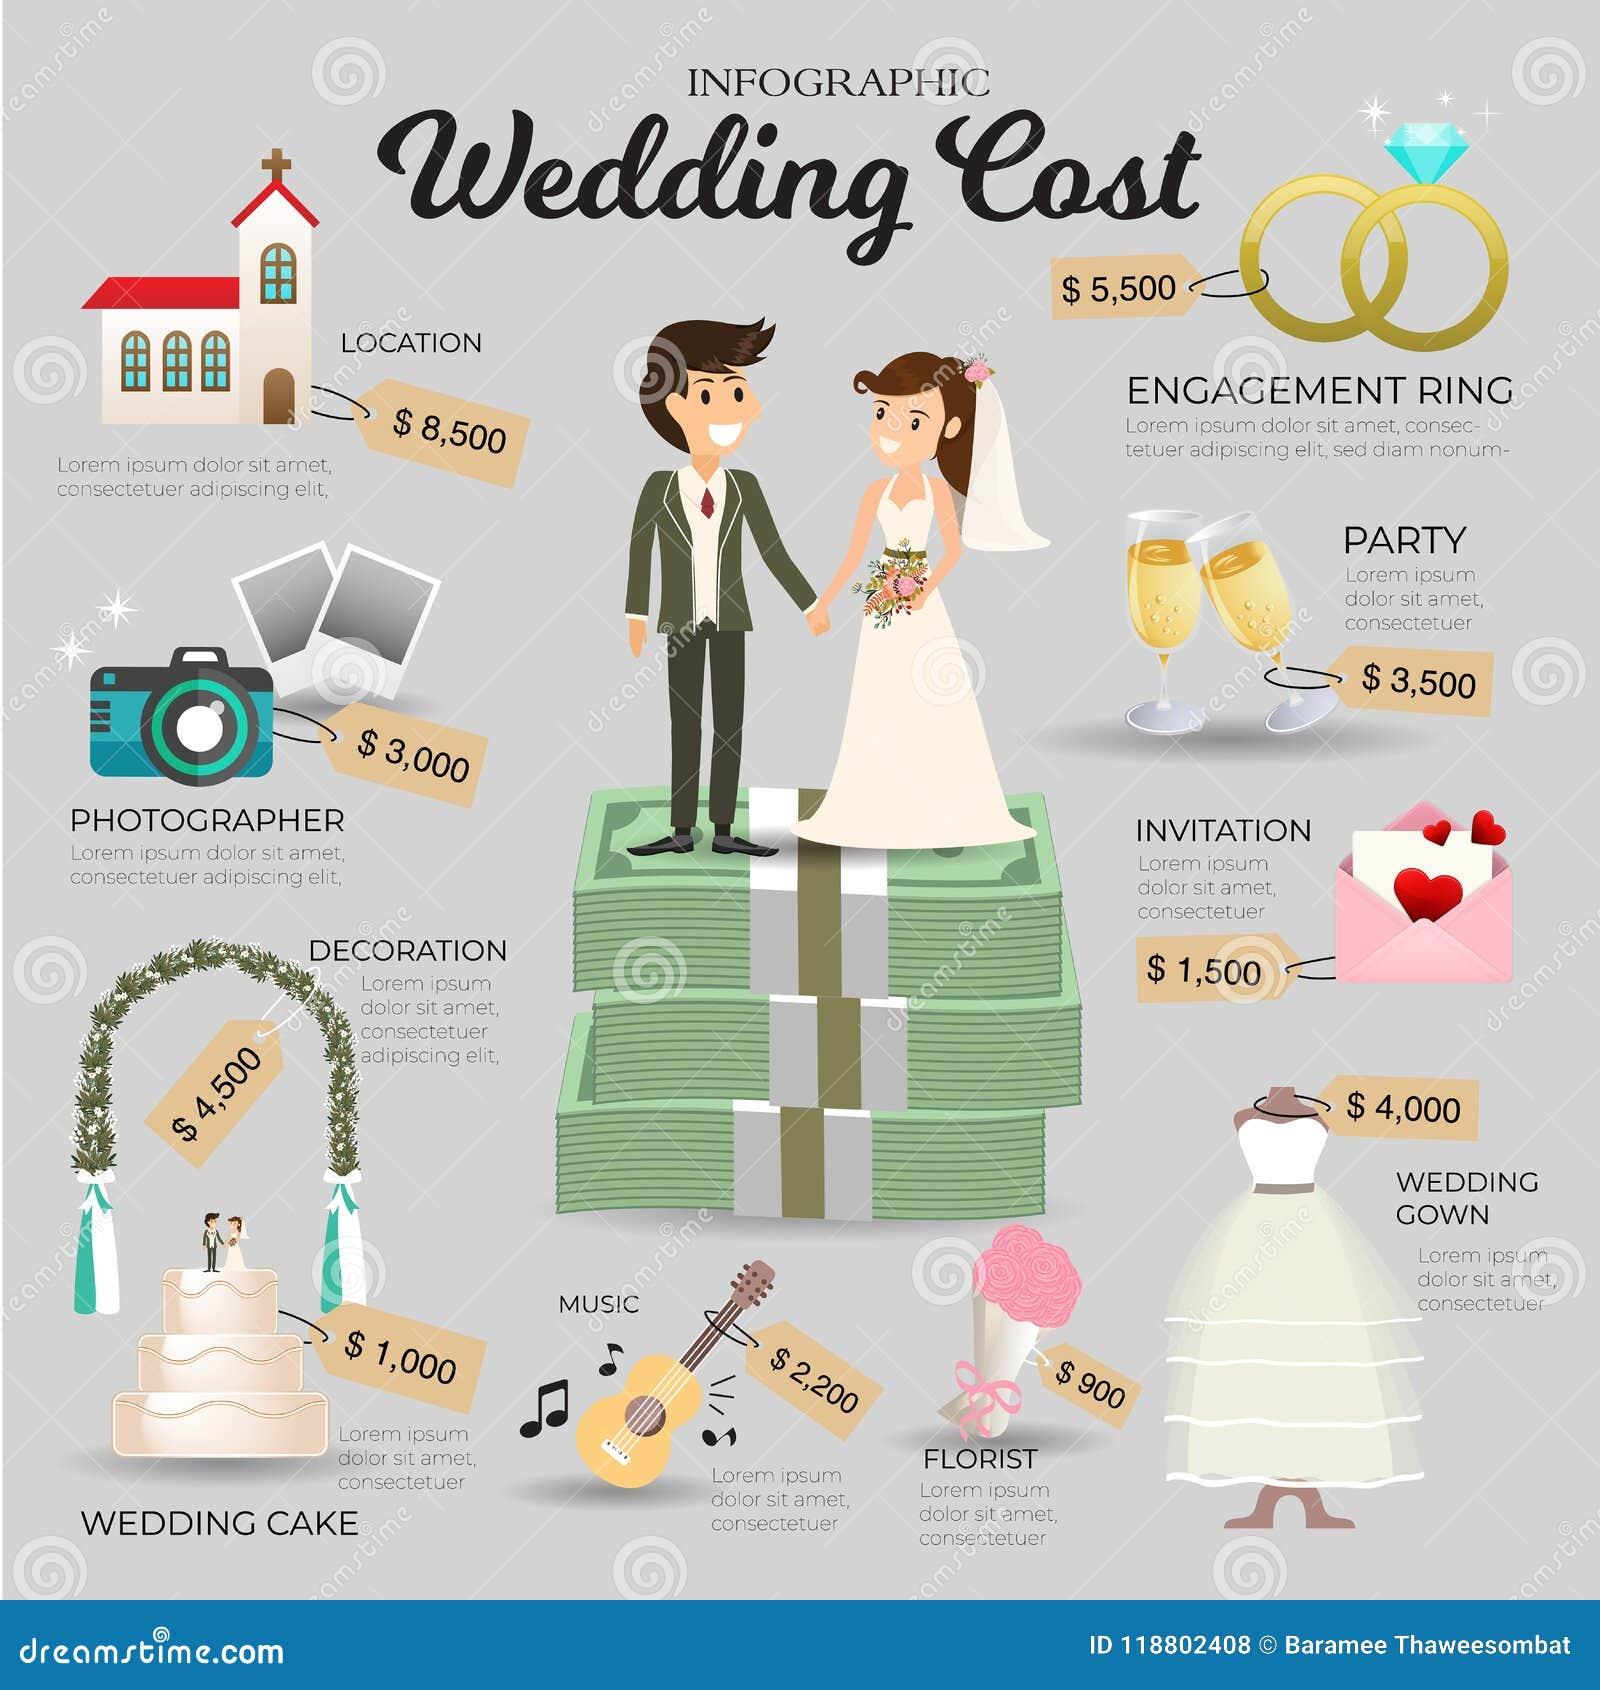 婚礼费用Infographic 矢量信息